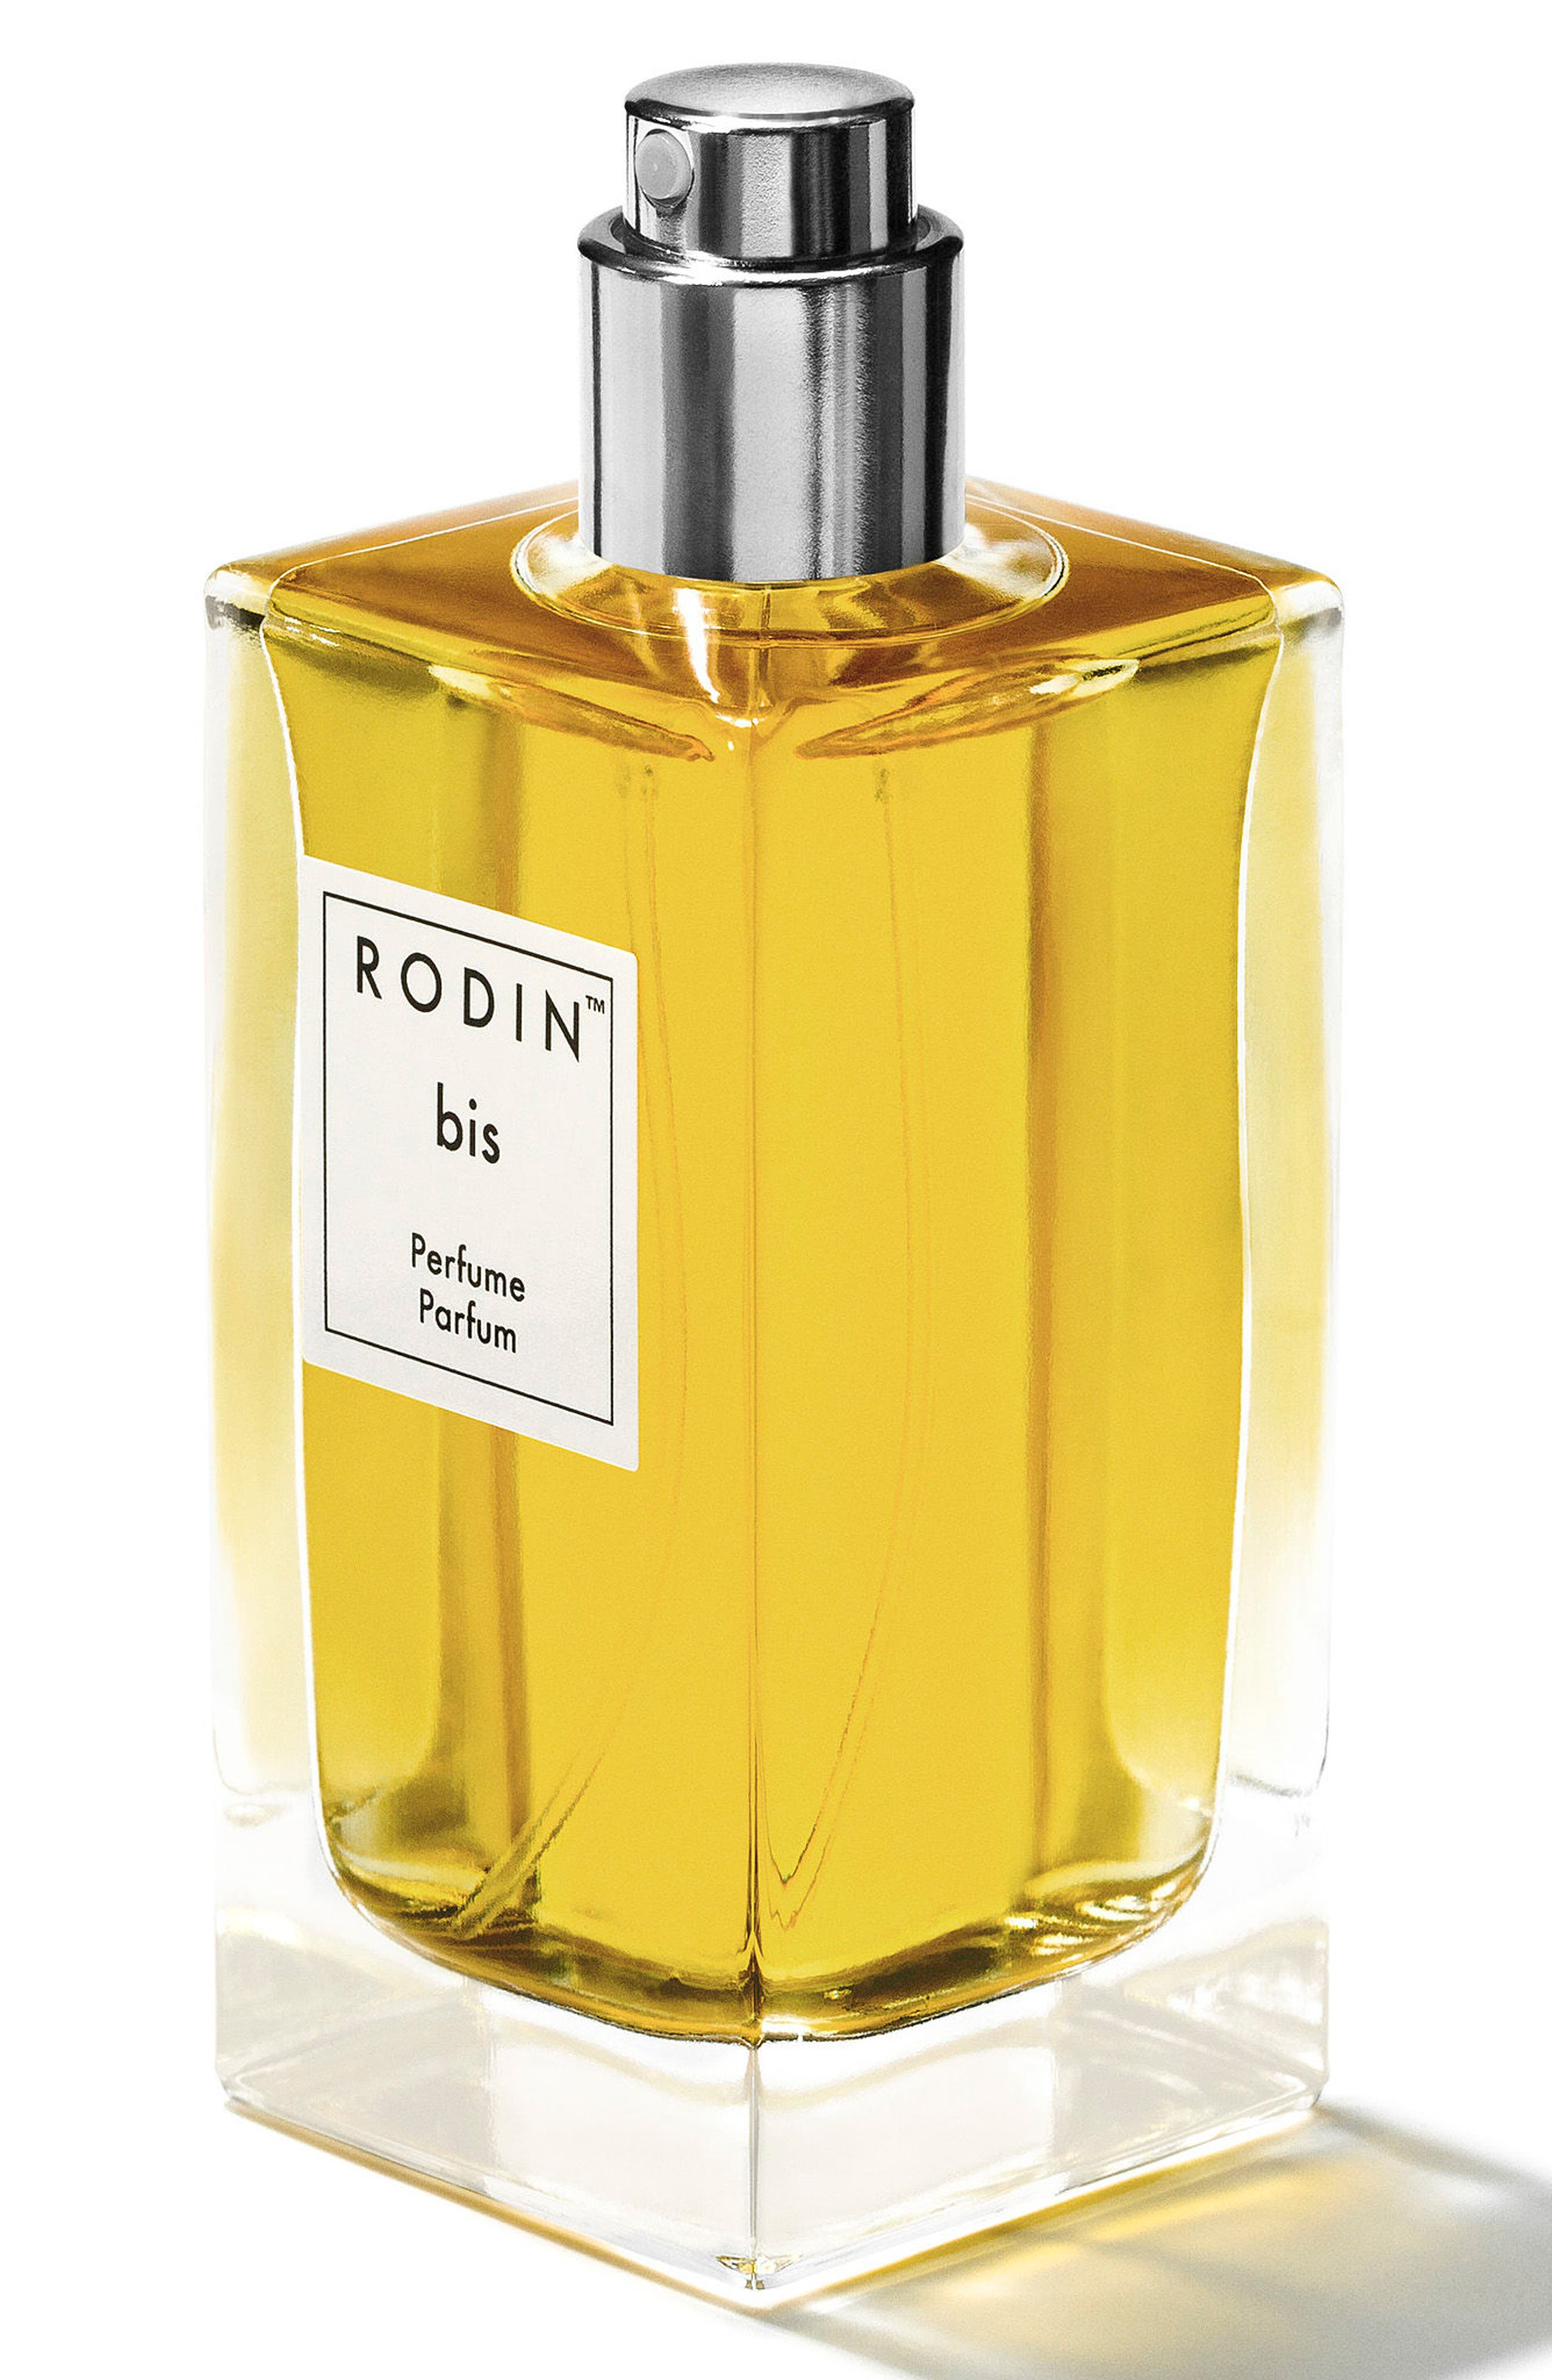 RODIN OLIO LUSSO,                             bis Perfume,                             Alternate thumbnail 3, color,                             NO COLOR